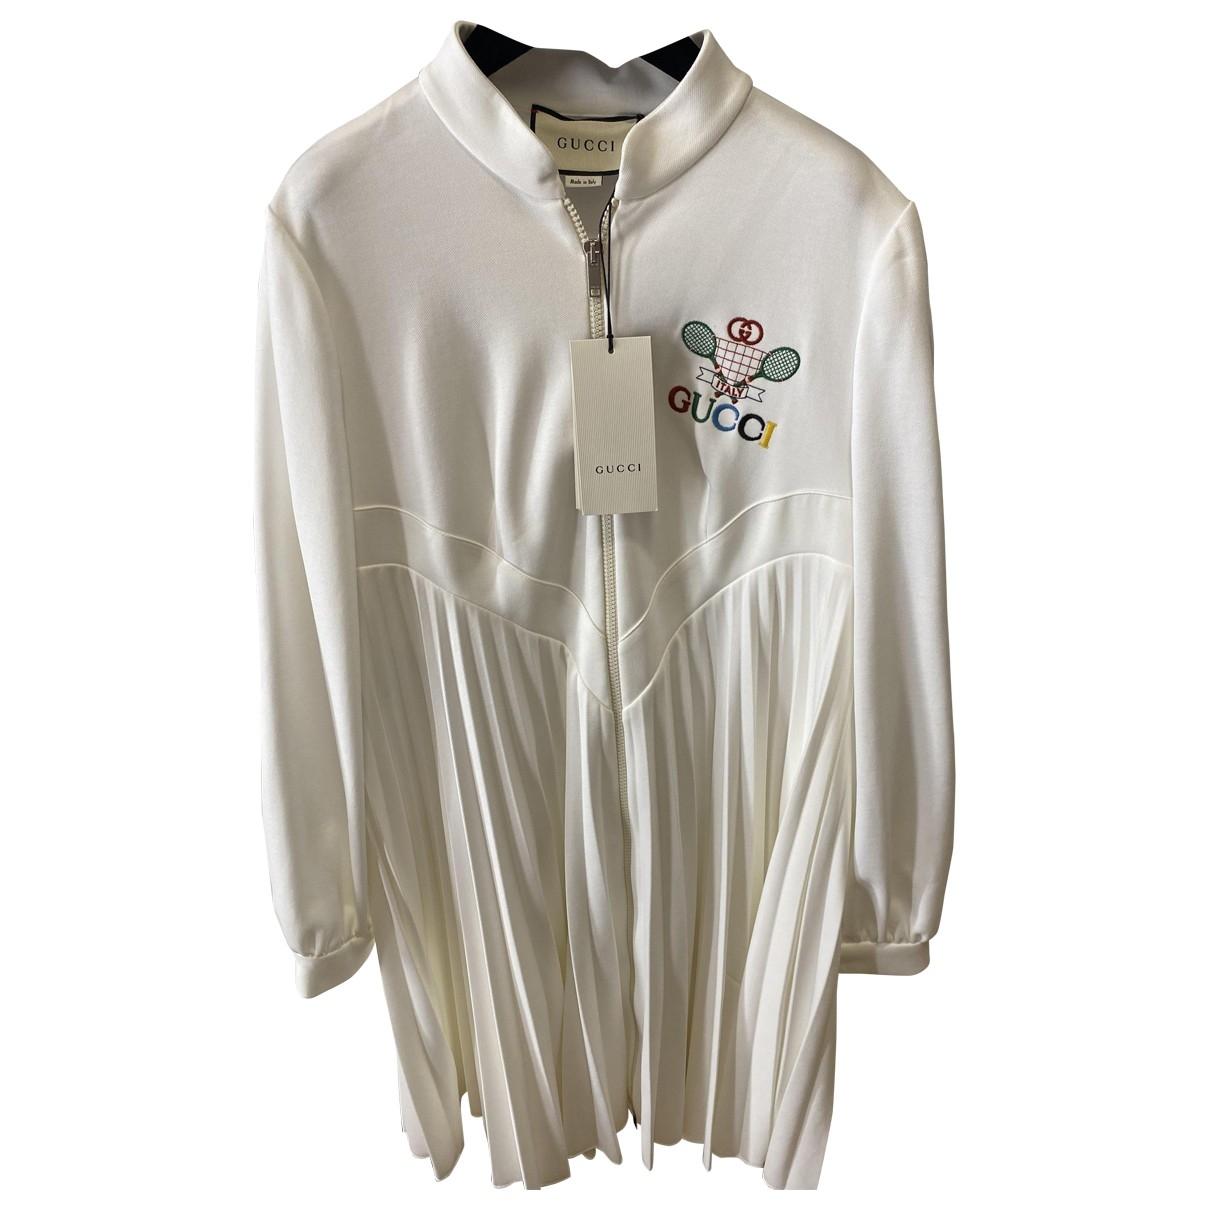 Gucci \N White Cotton dress for Women S International